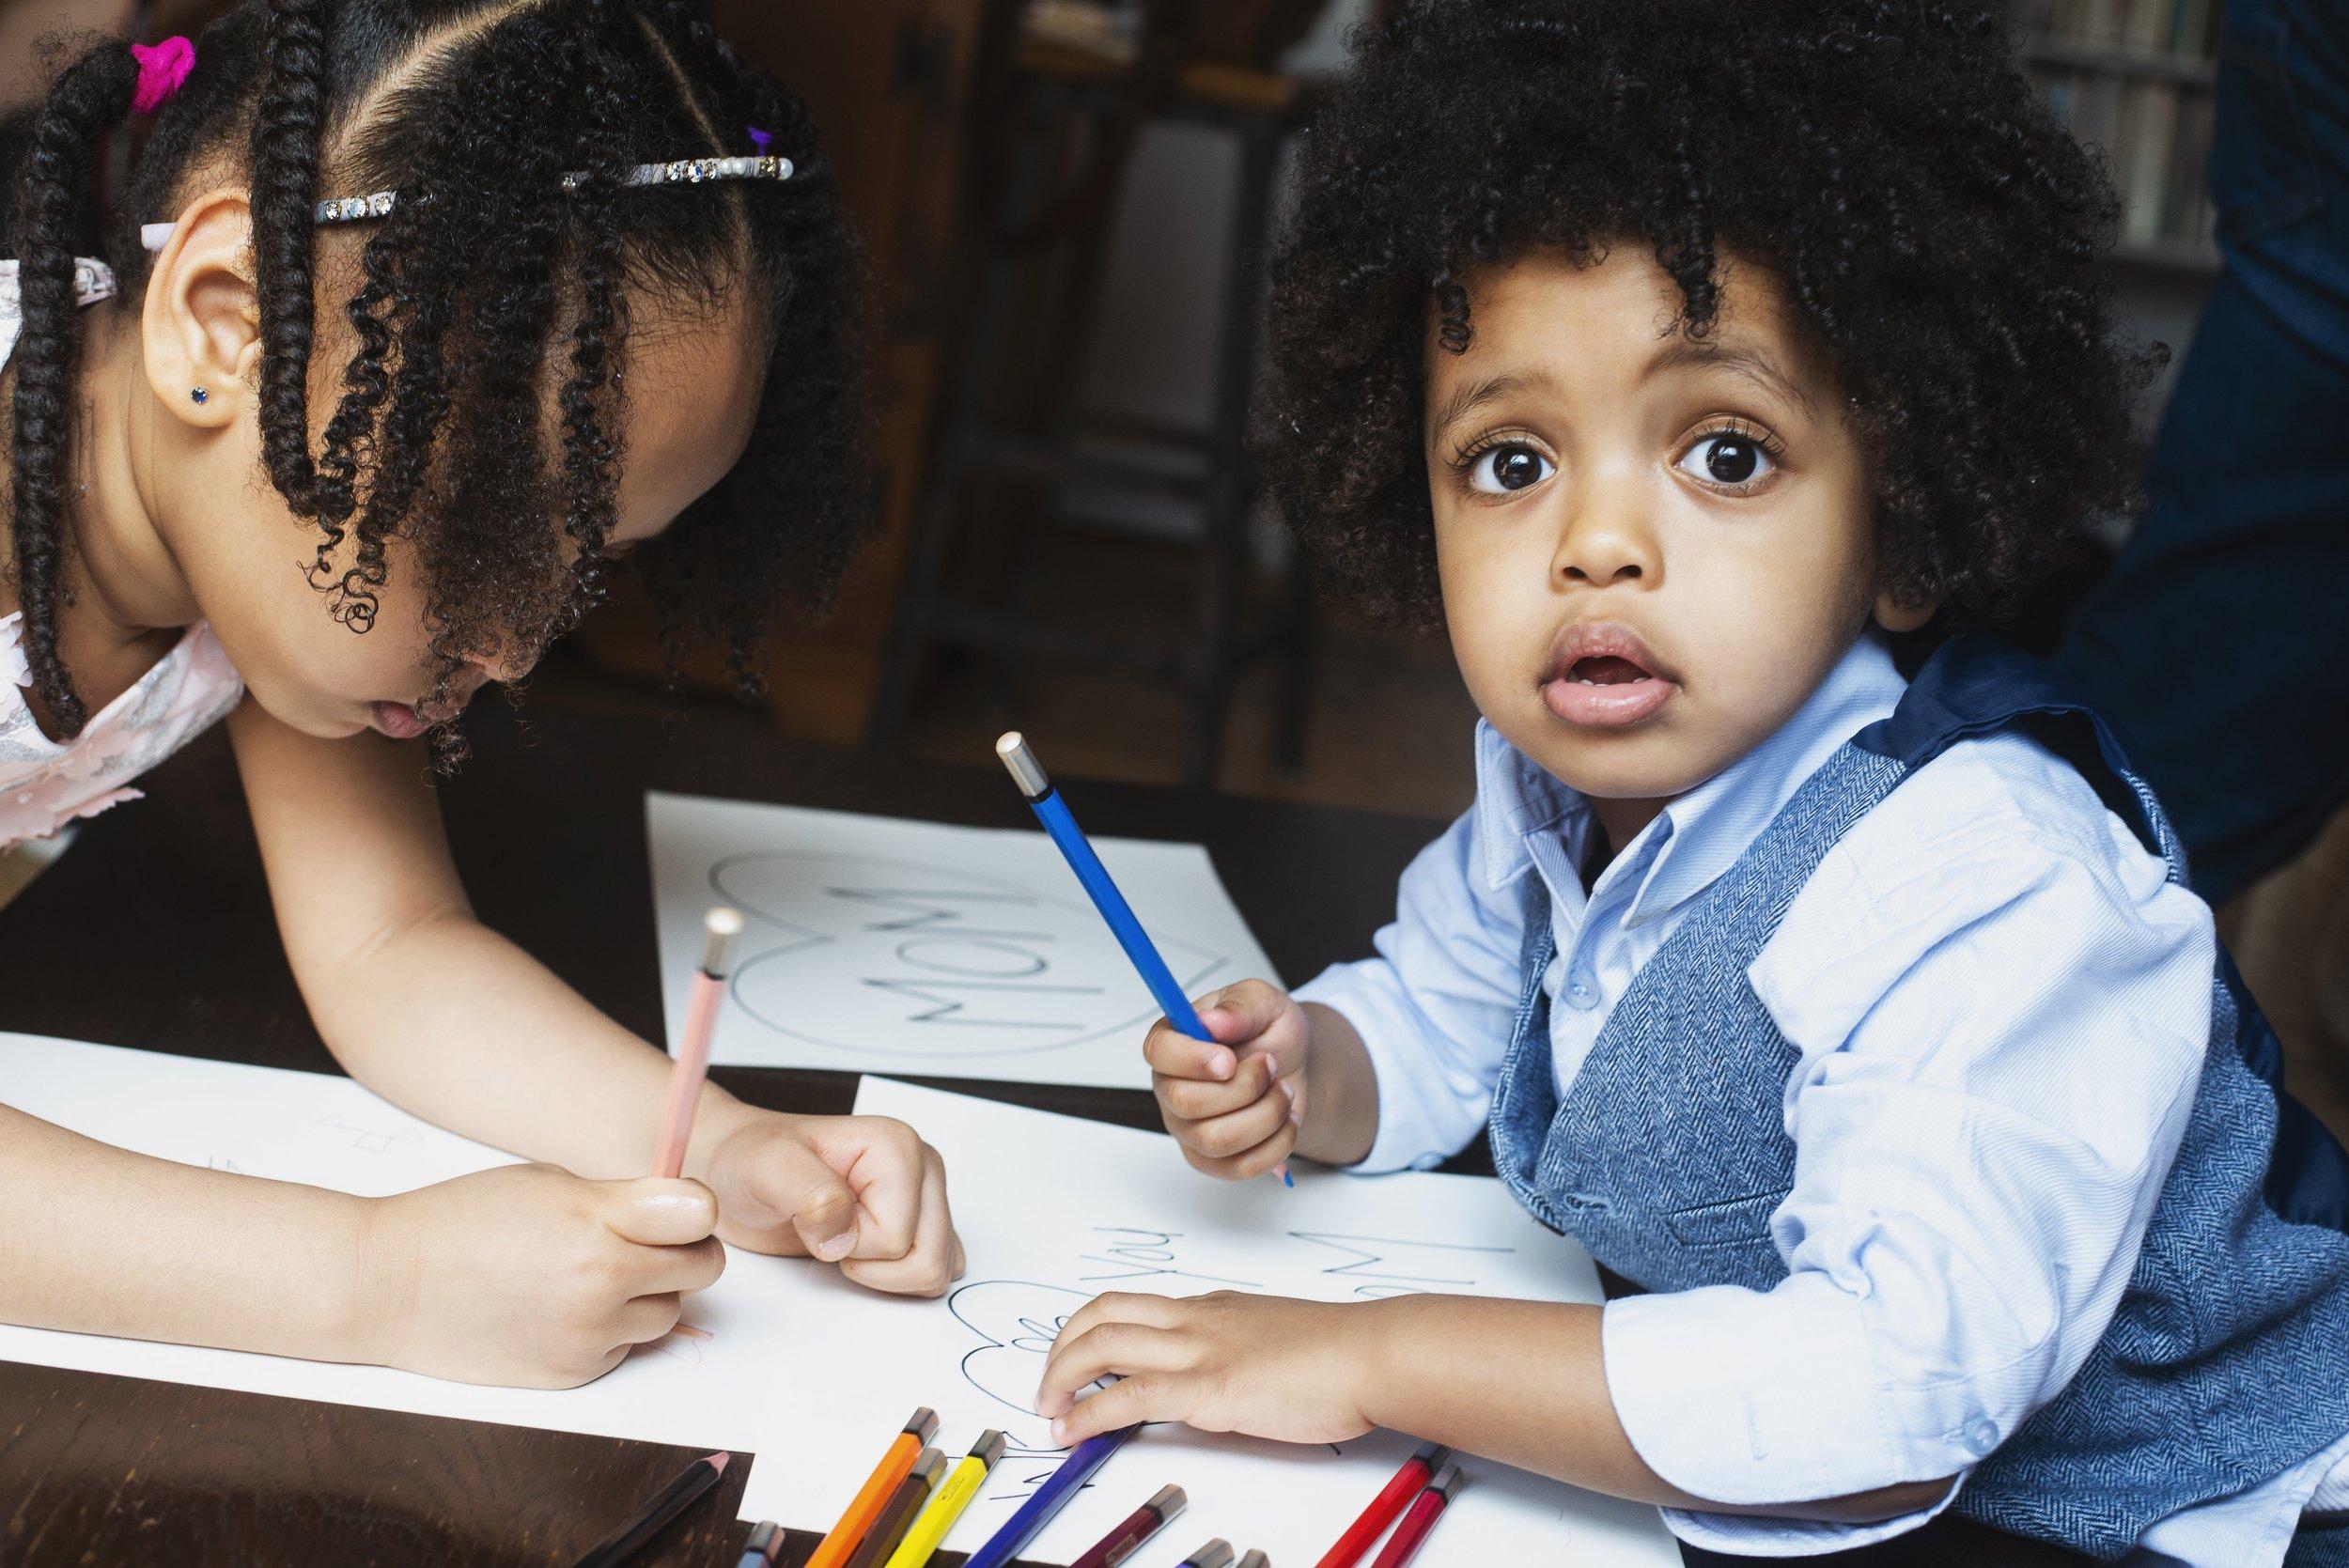 kids-coloring-at-table_4460x4460.jpg